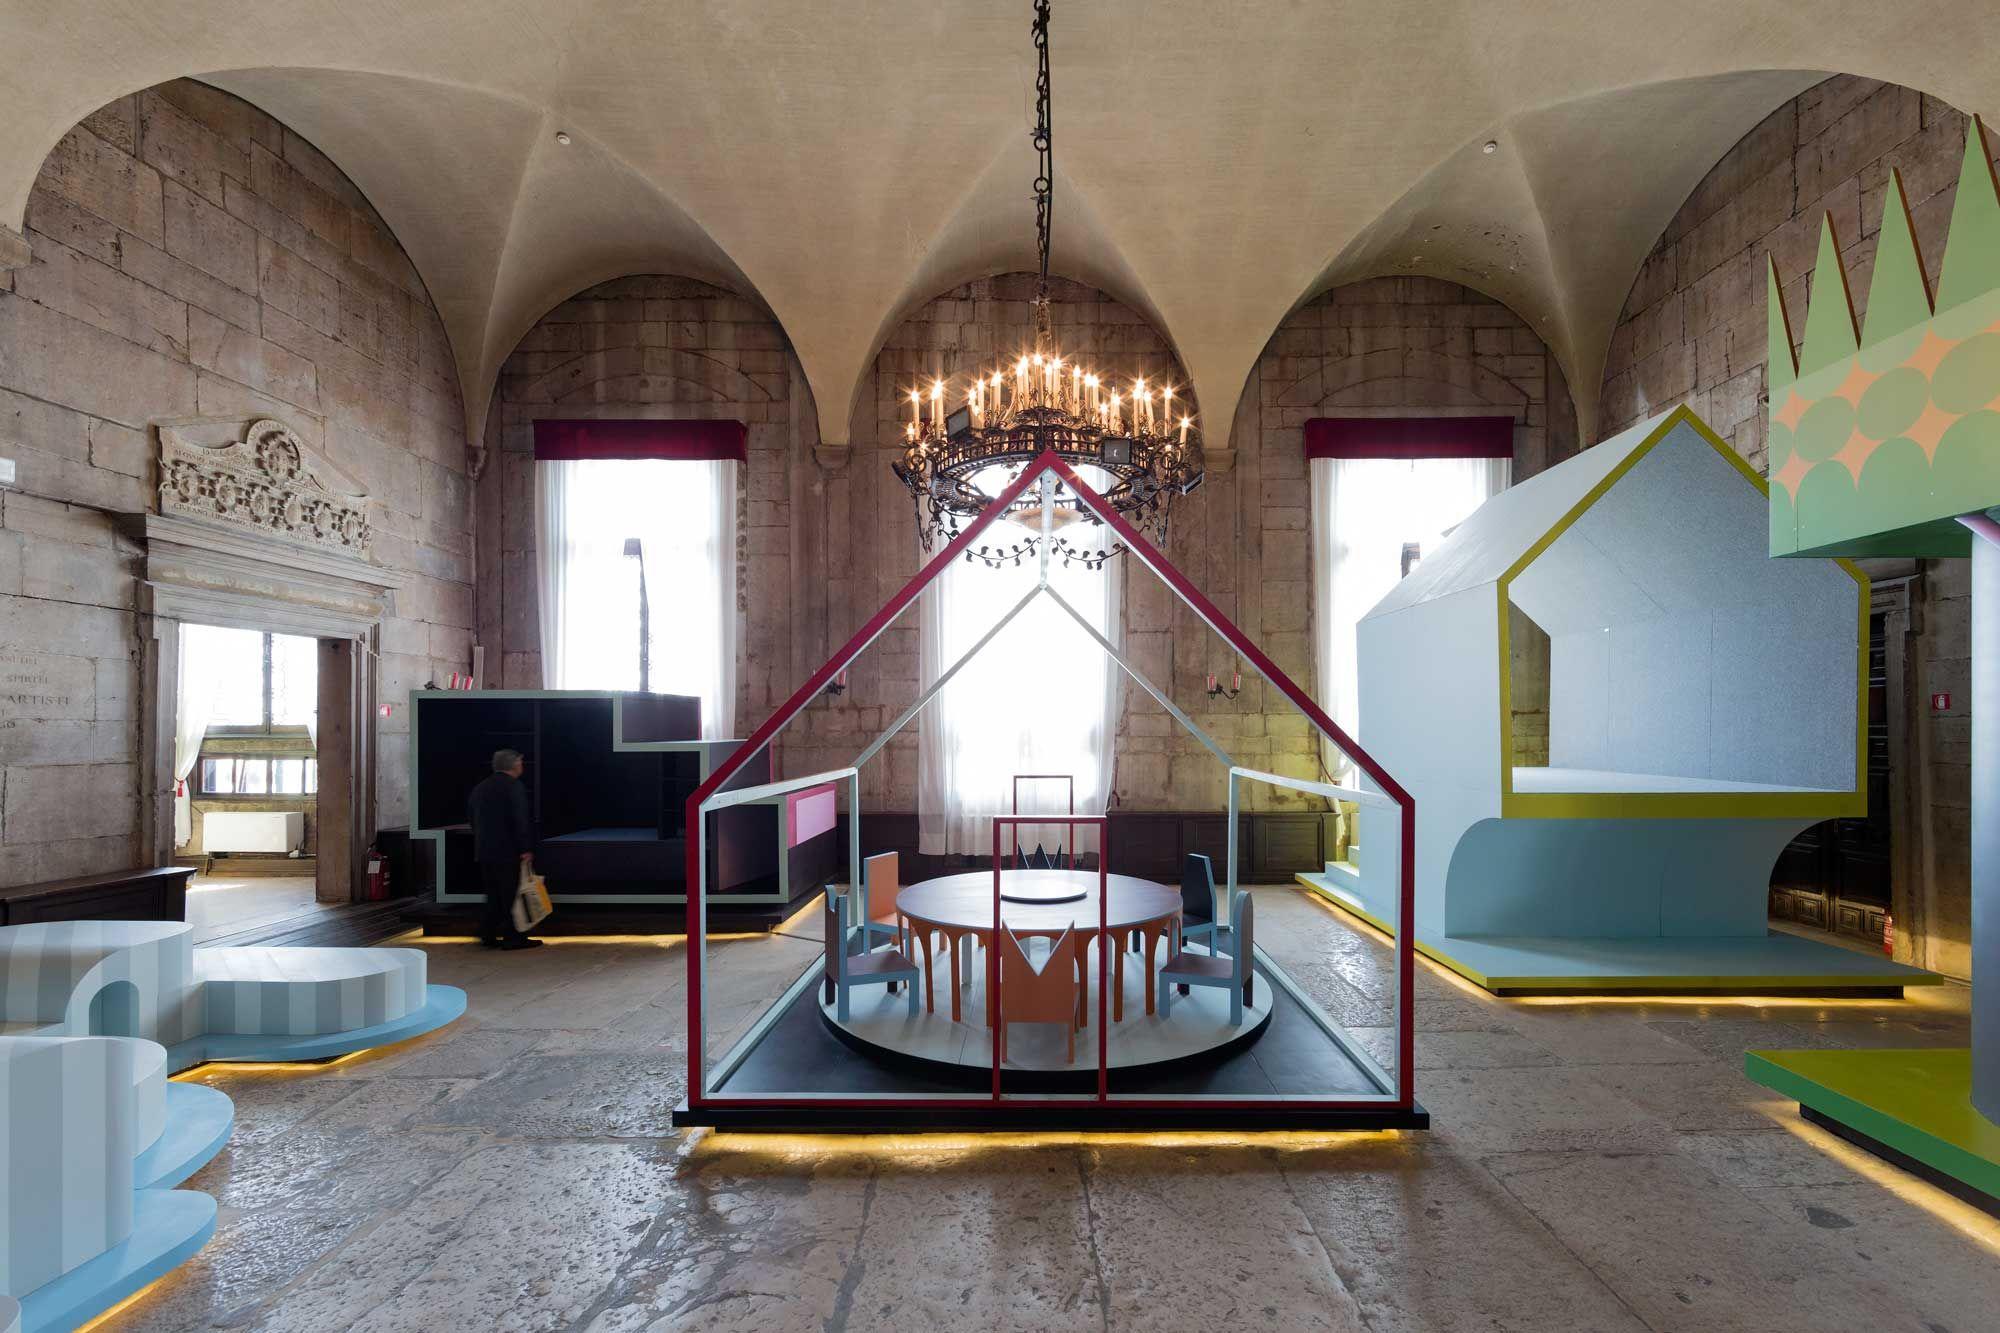 Bureau spectacular u chicago architecture biennial installations